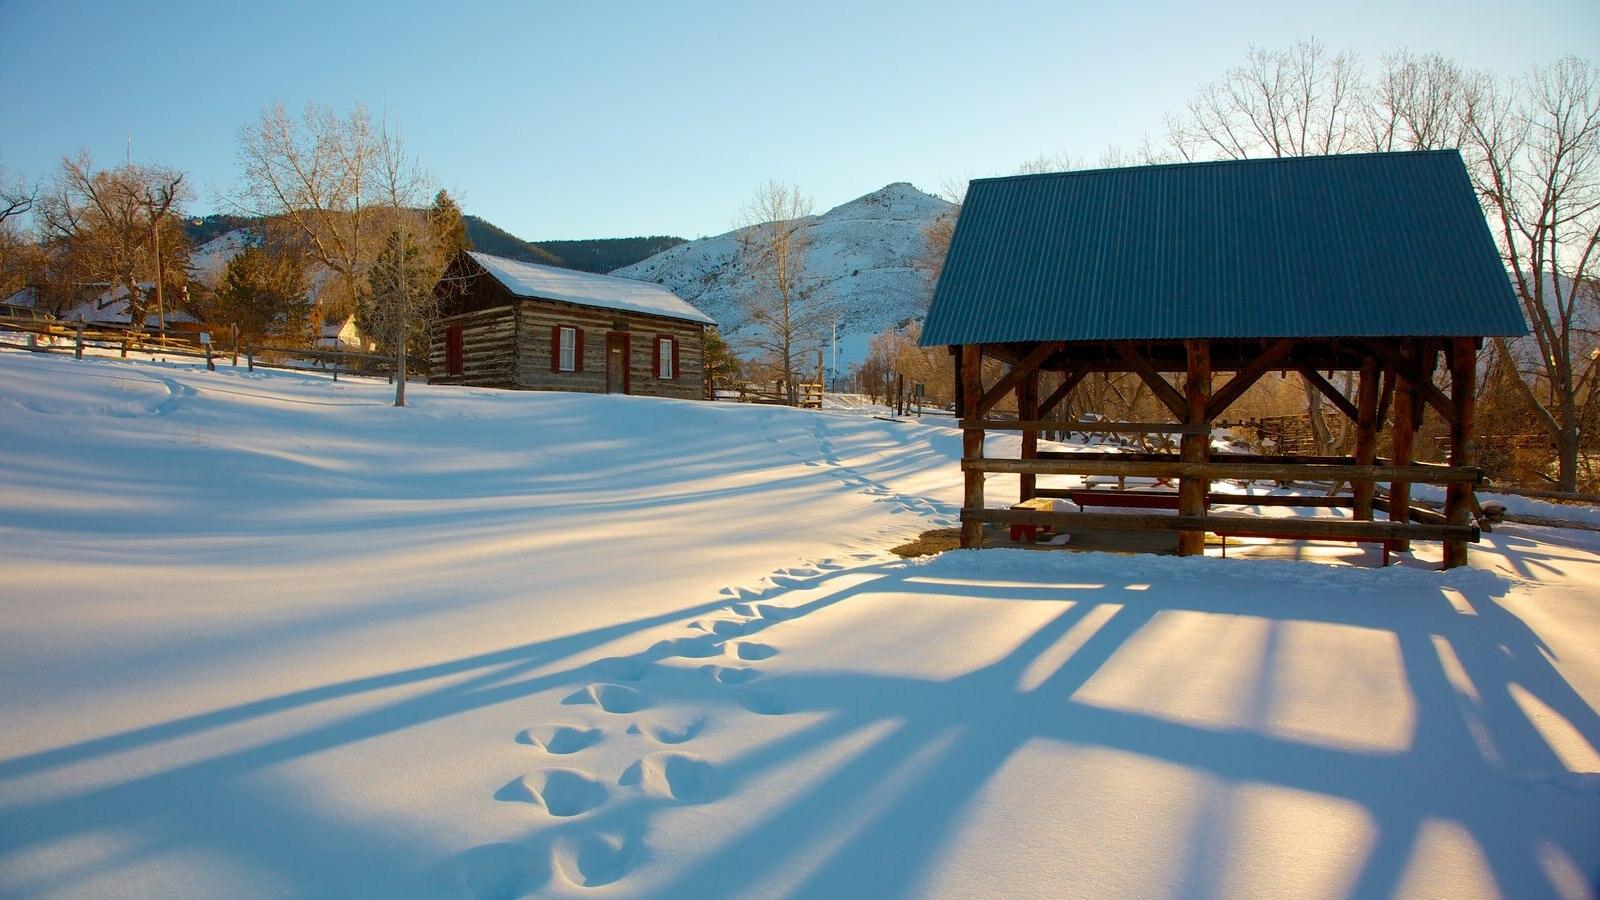 Colorado que inclui neve